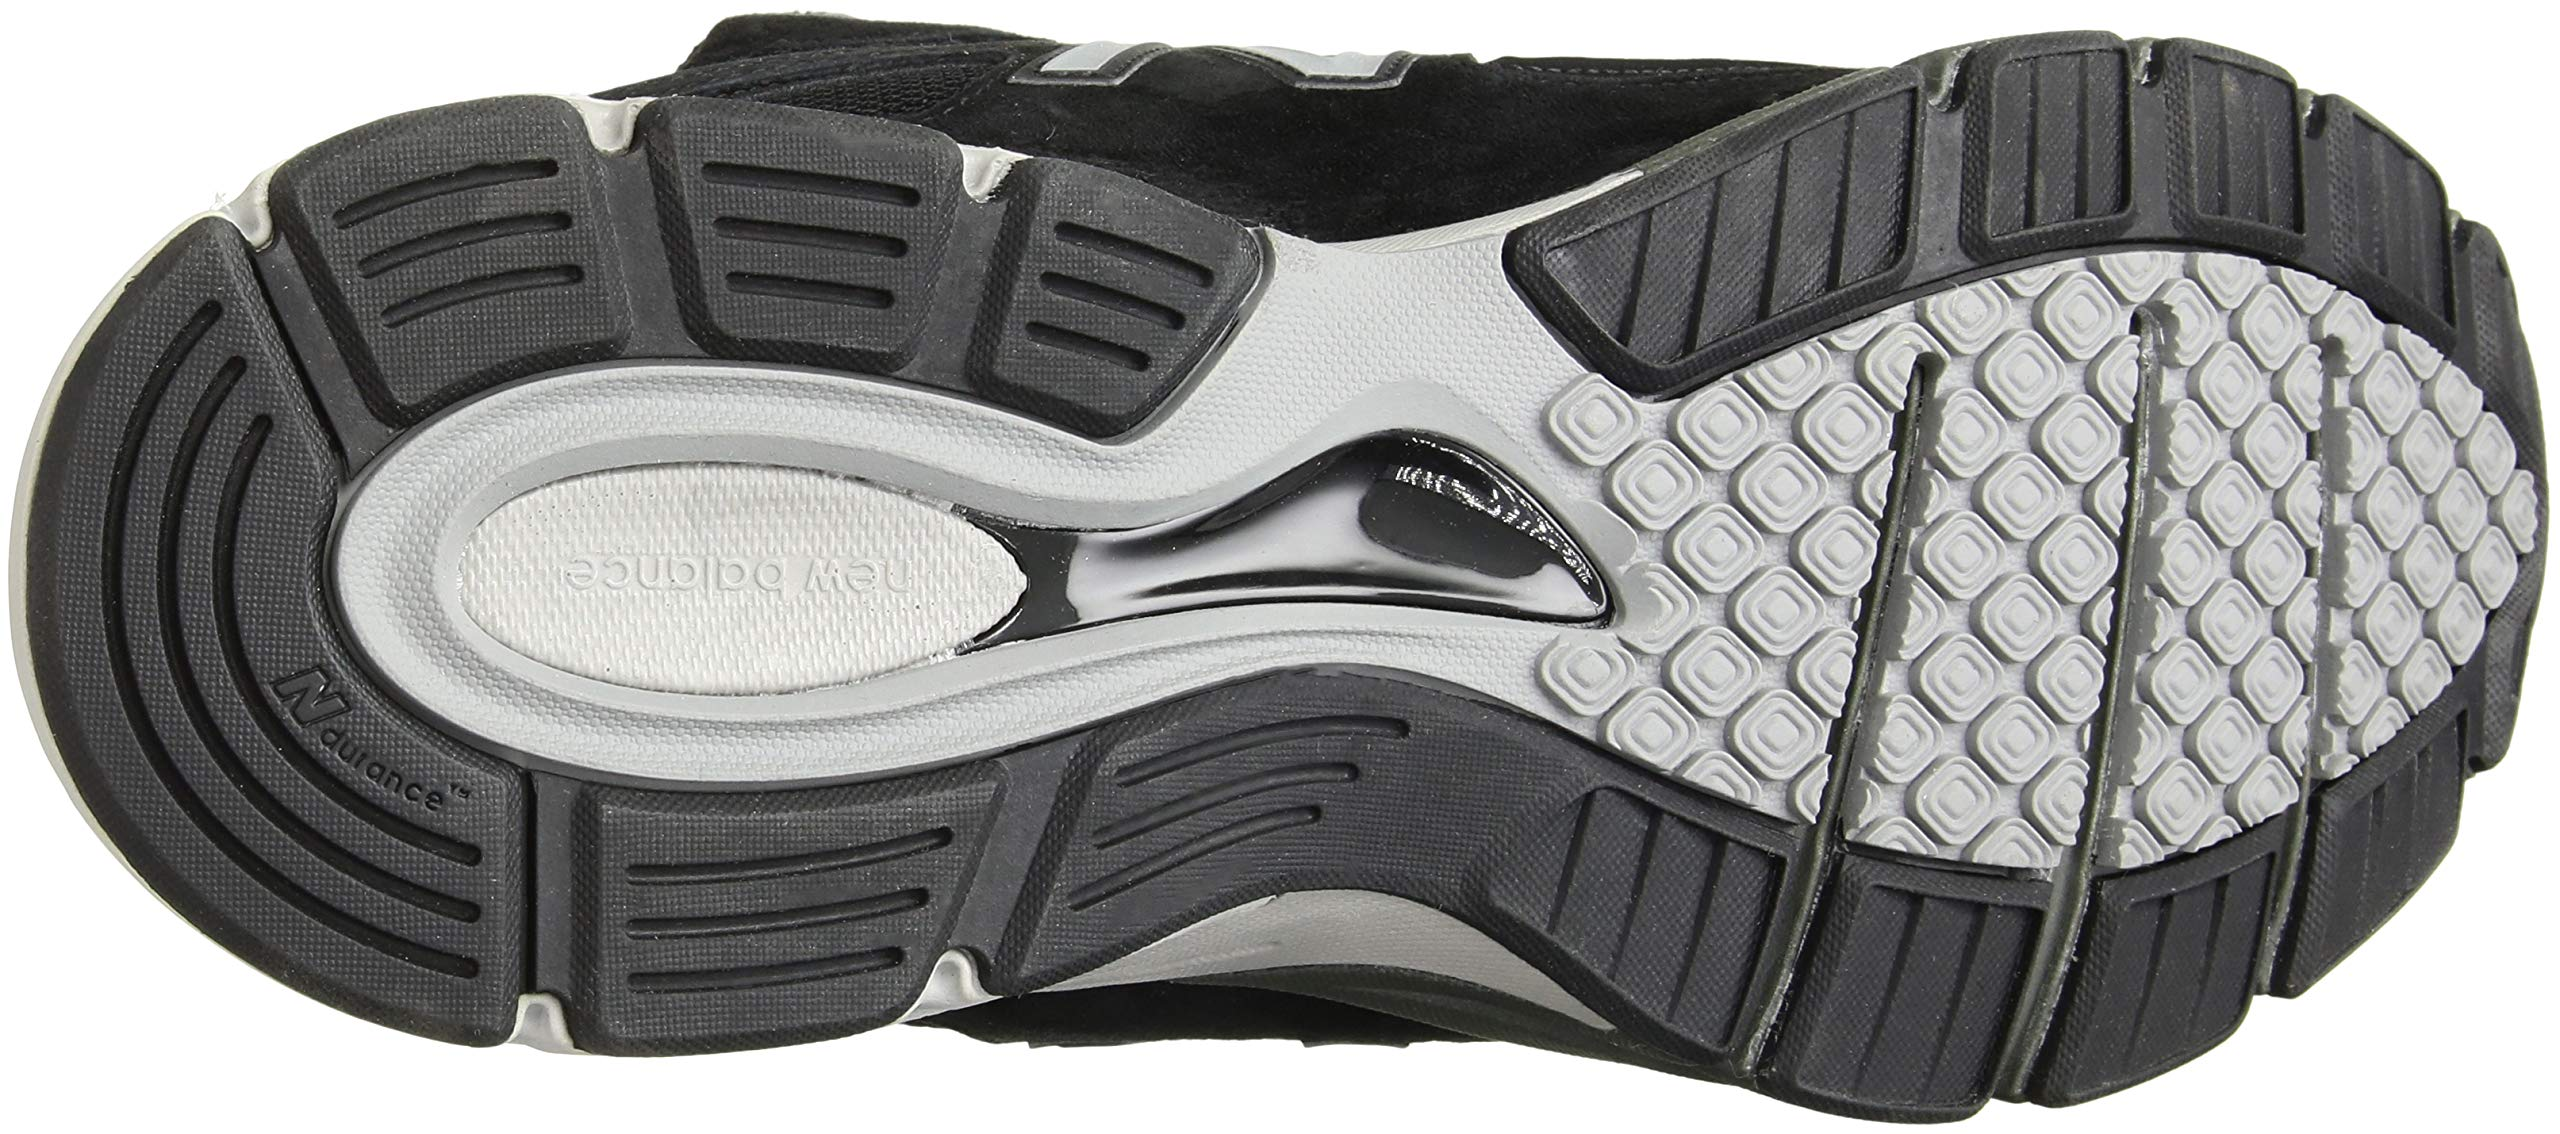 819HPakyumL - New Balance Mens M990 990v4 Black Size: 7.5 Wide